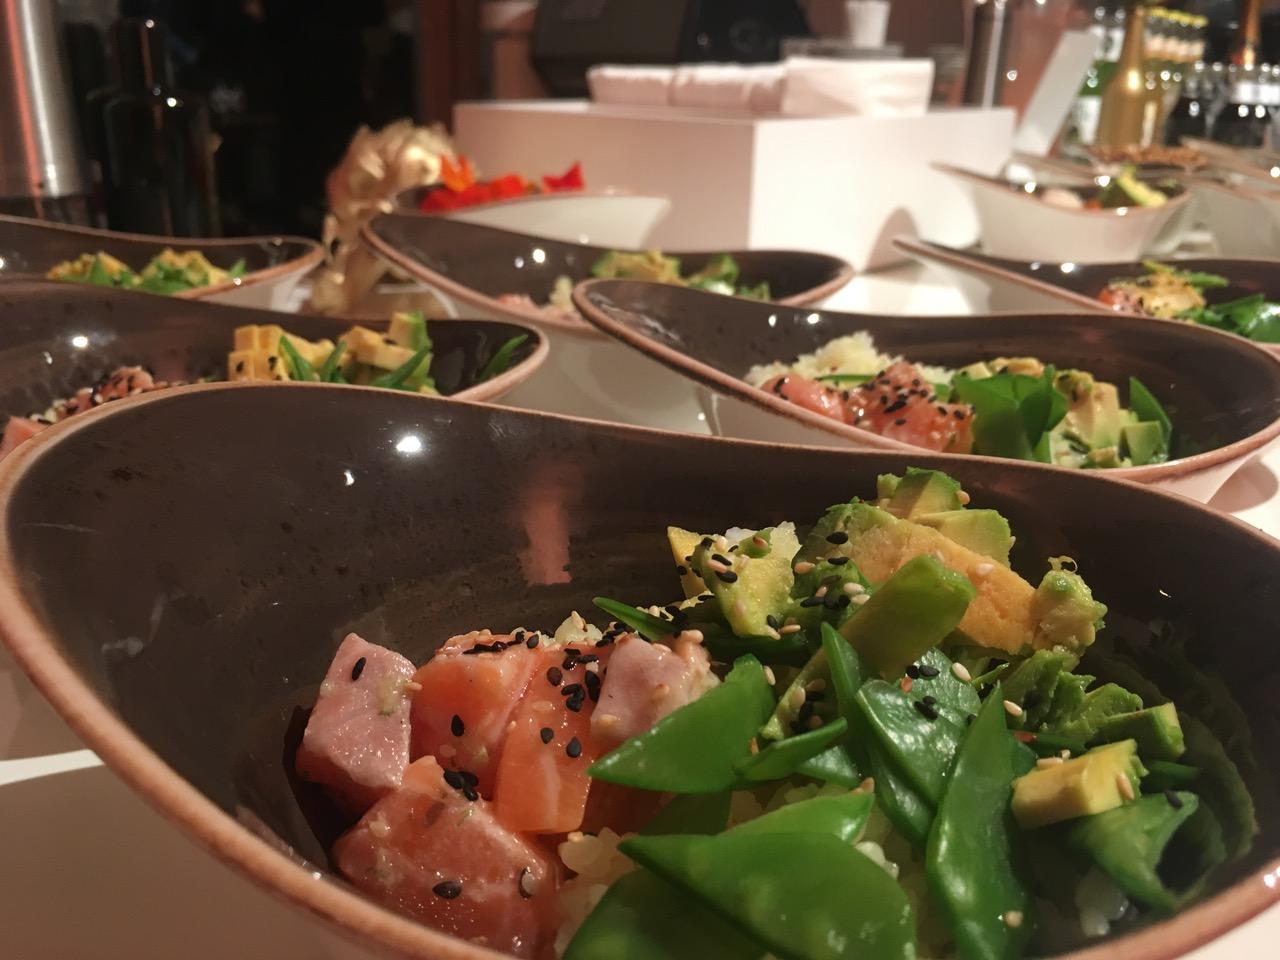 Lachs Poké als Bowl Food von der Live Station